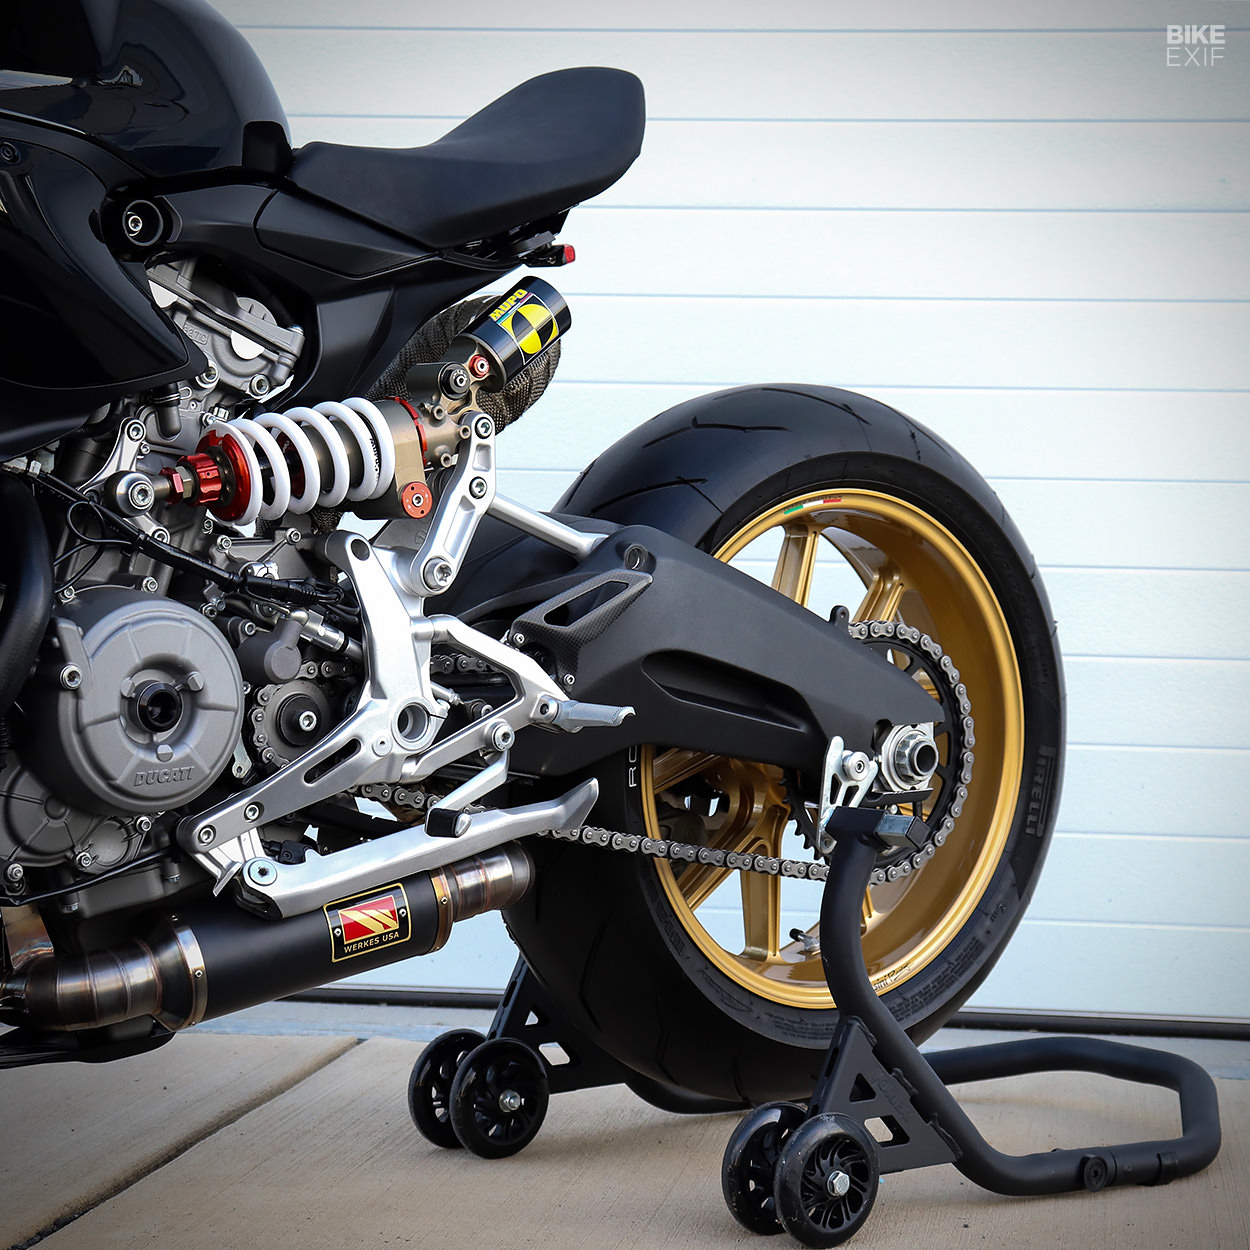 Custom Ducati 959 Panigale from Jett Design